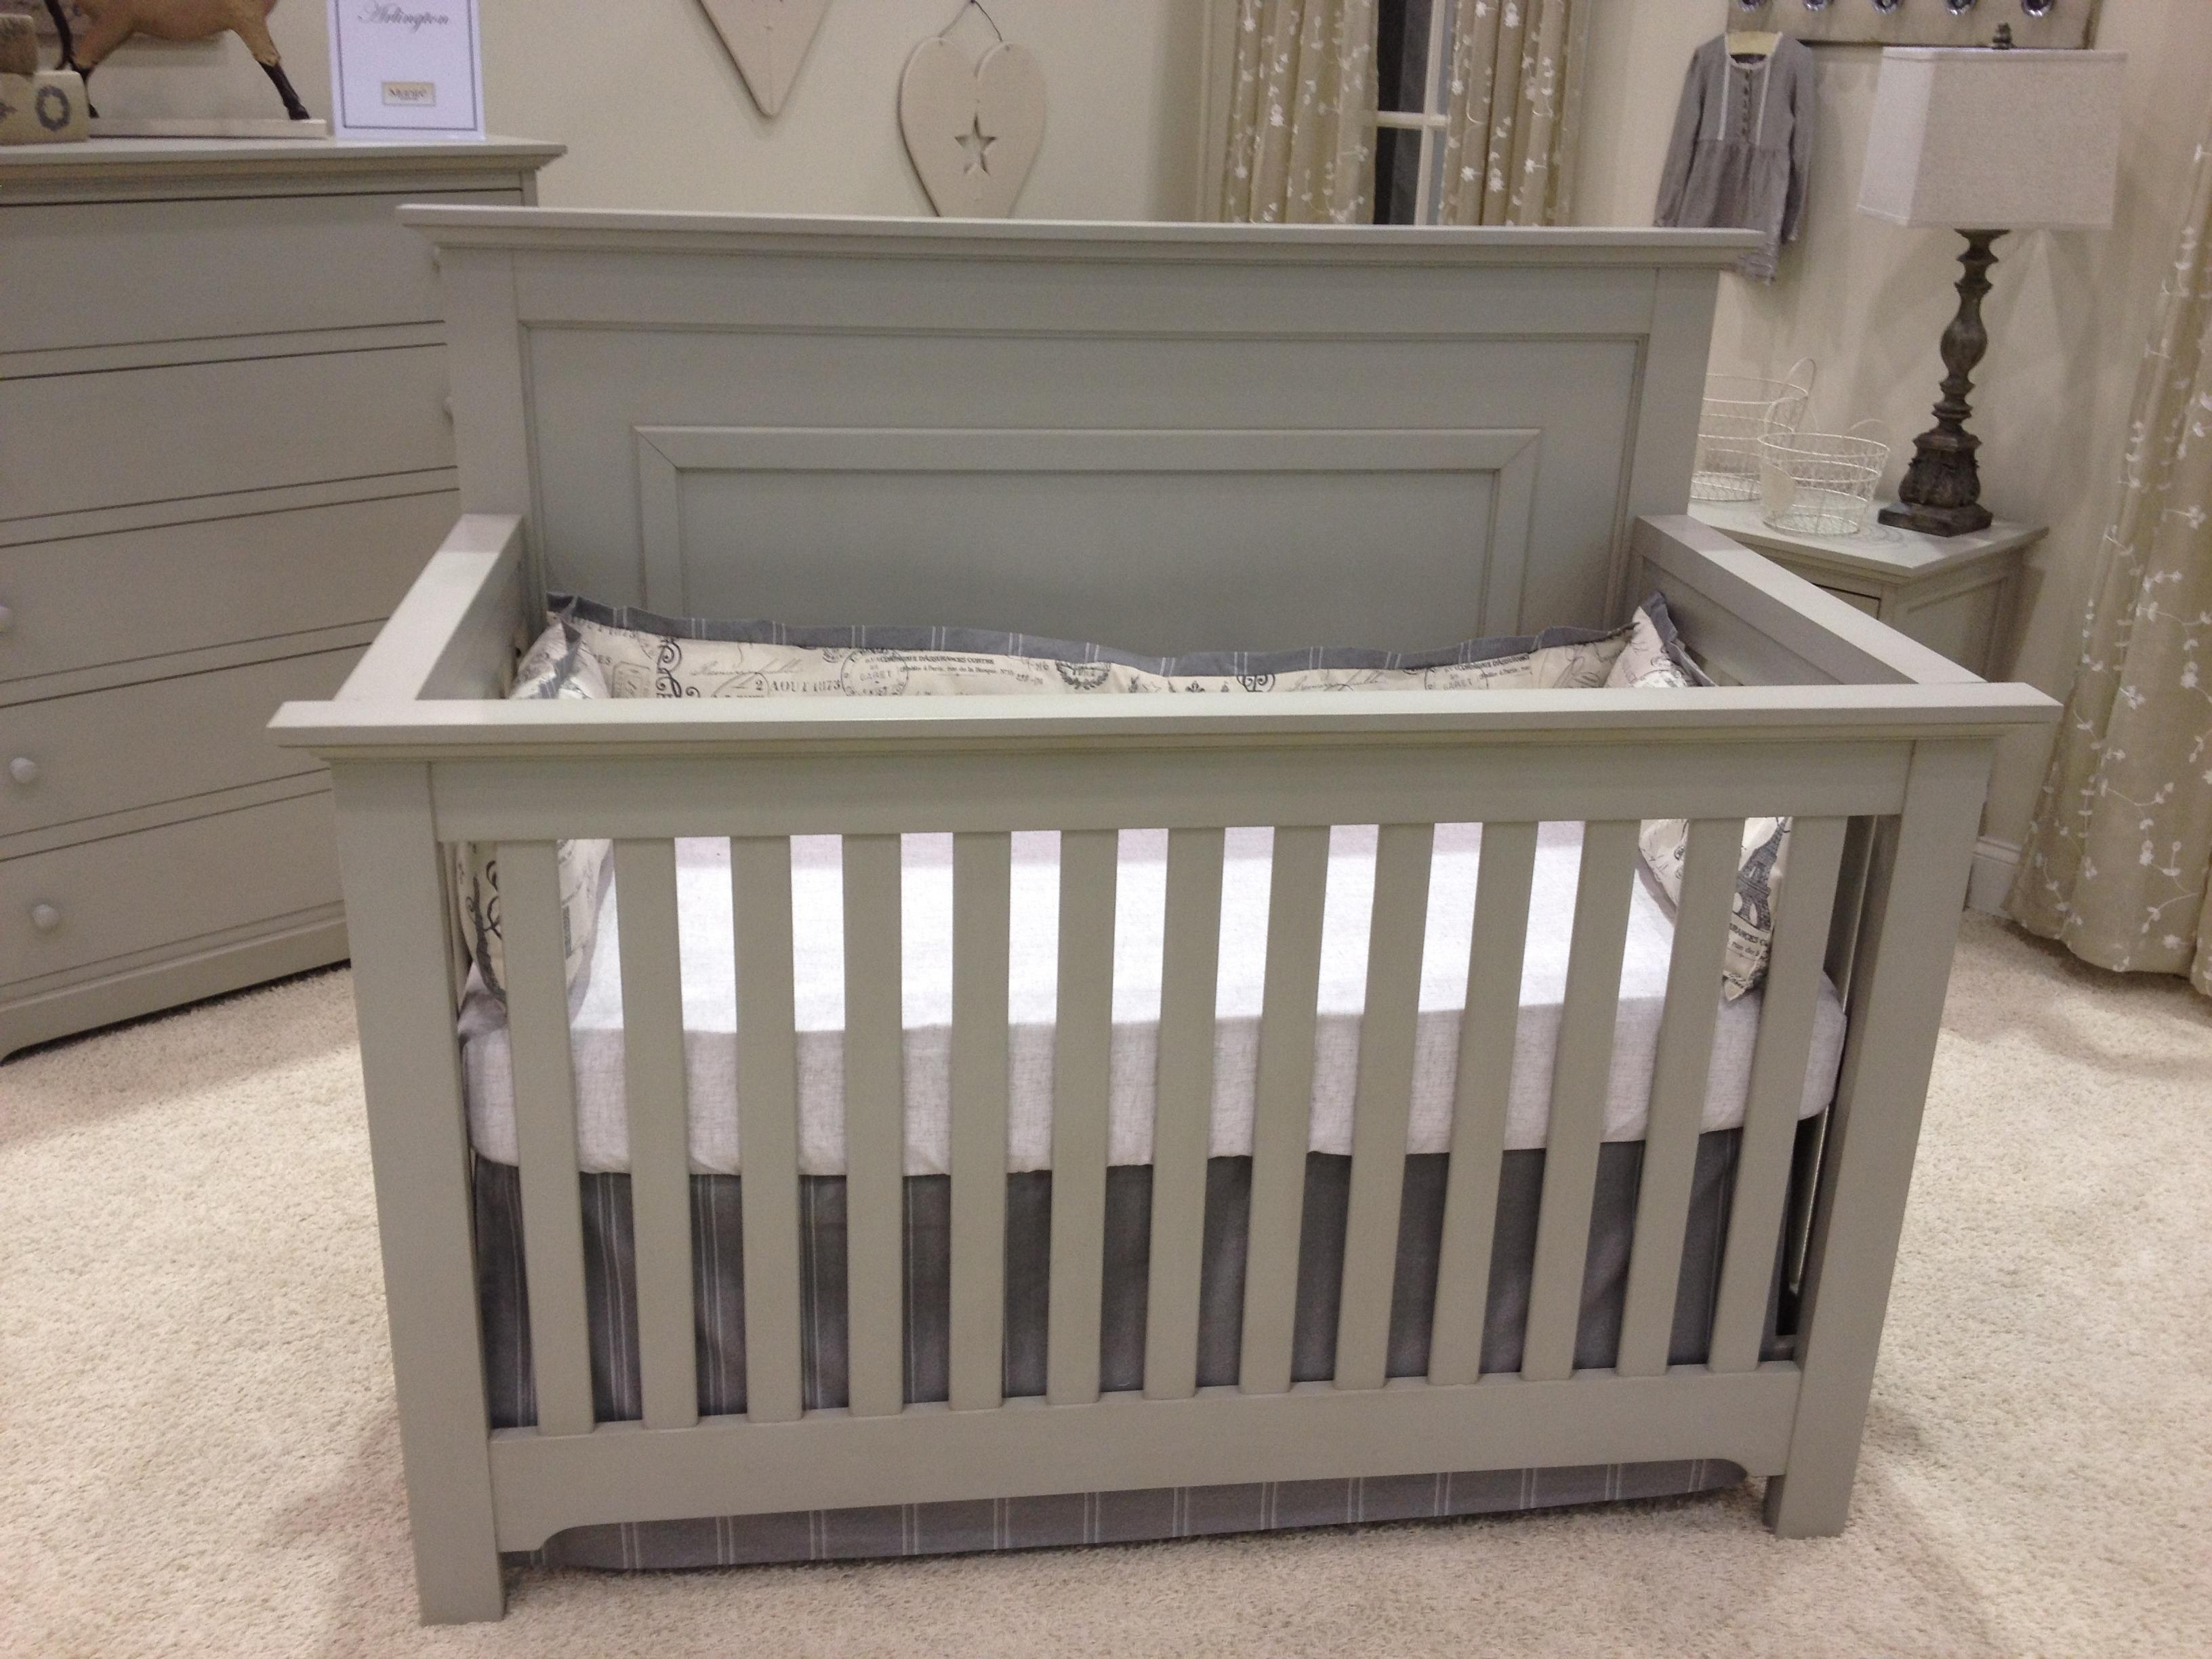 Sorelle Princeton Tuscany Crib | Sorelle 4 in 1 Convertible Crib | Sorelle Vicki Crib